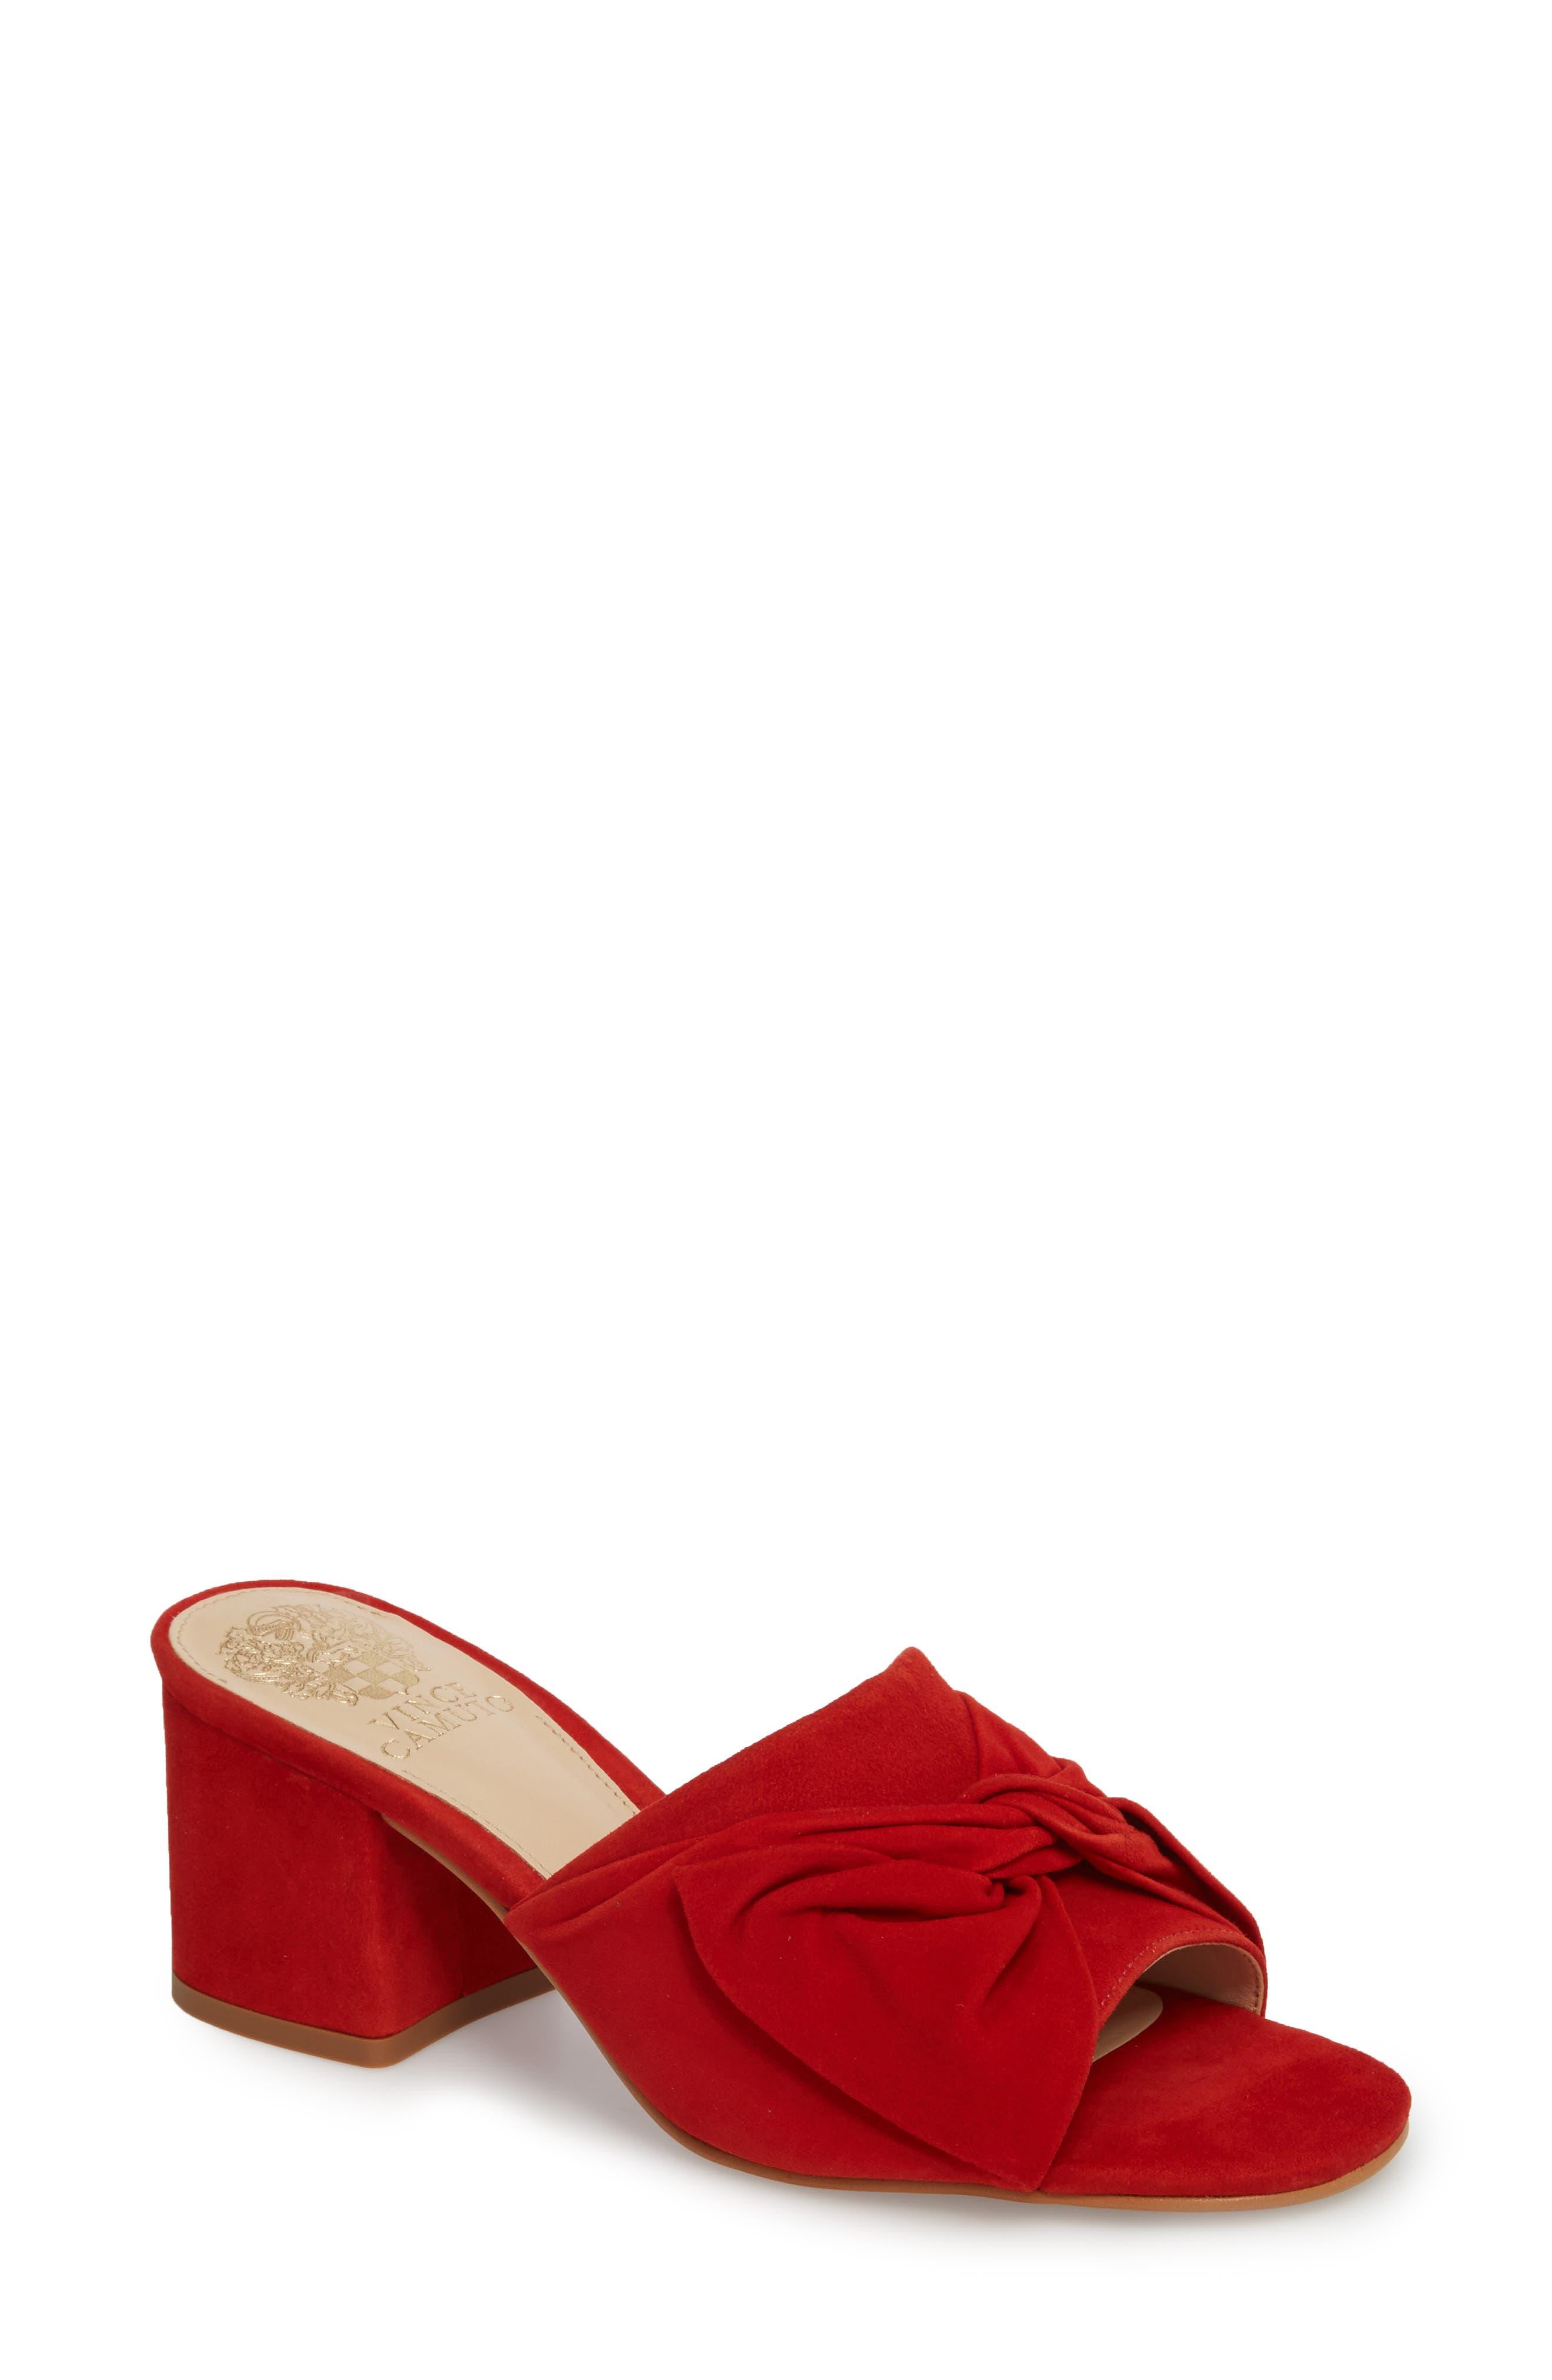 Sharrey Sandal,                         Main,                         color, Red Hot Rio Suede